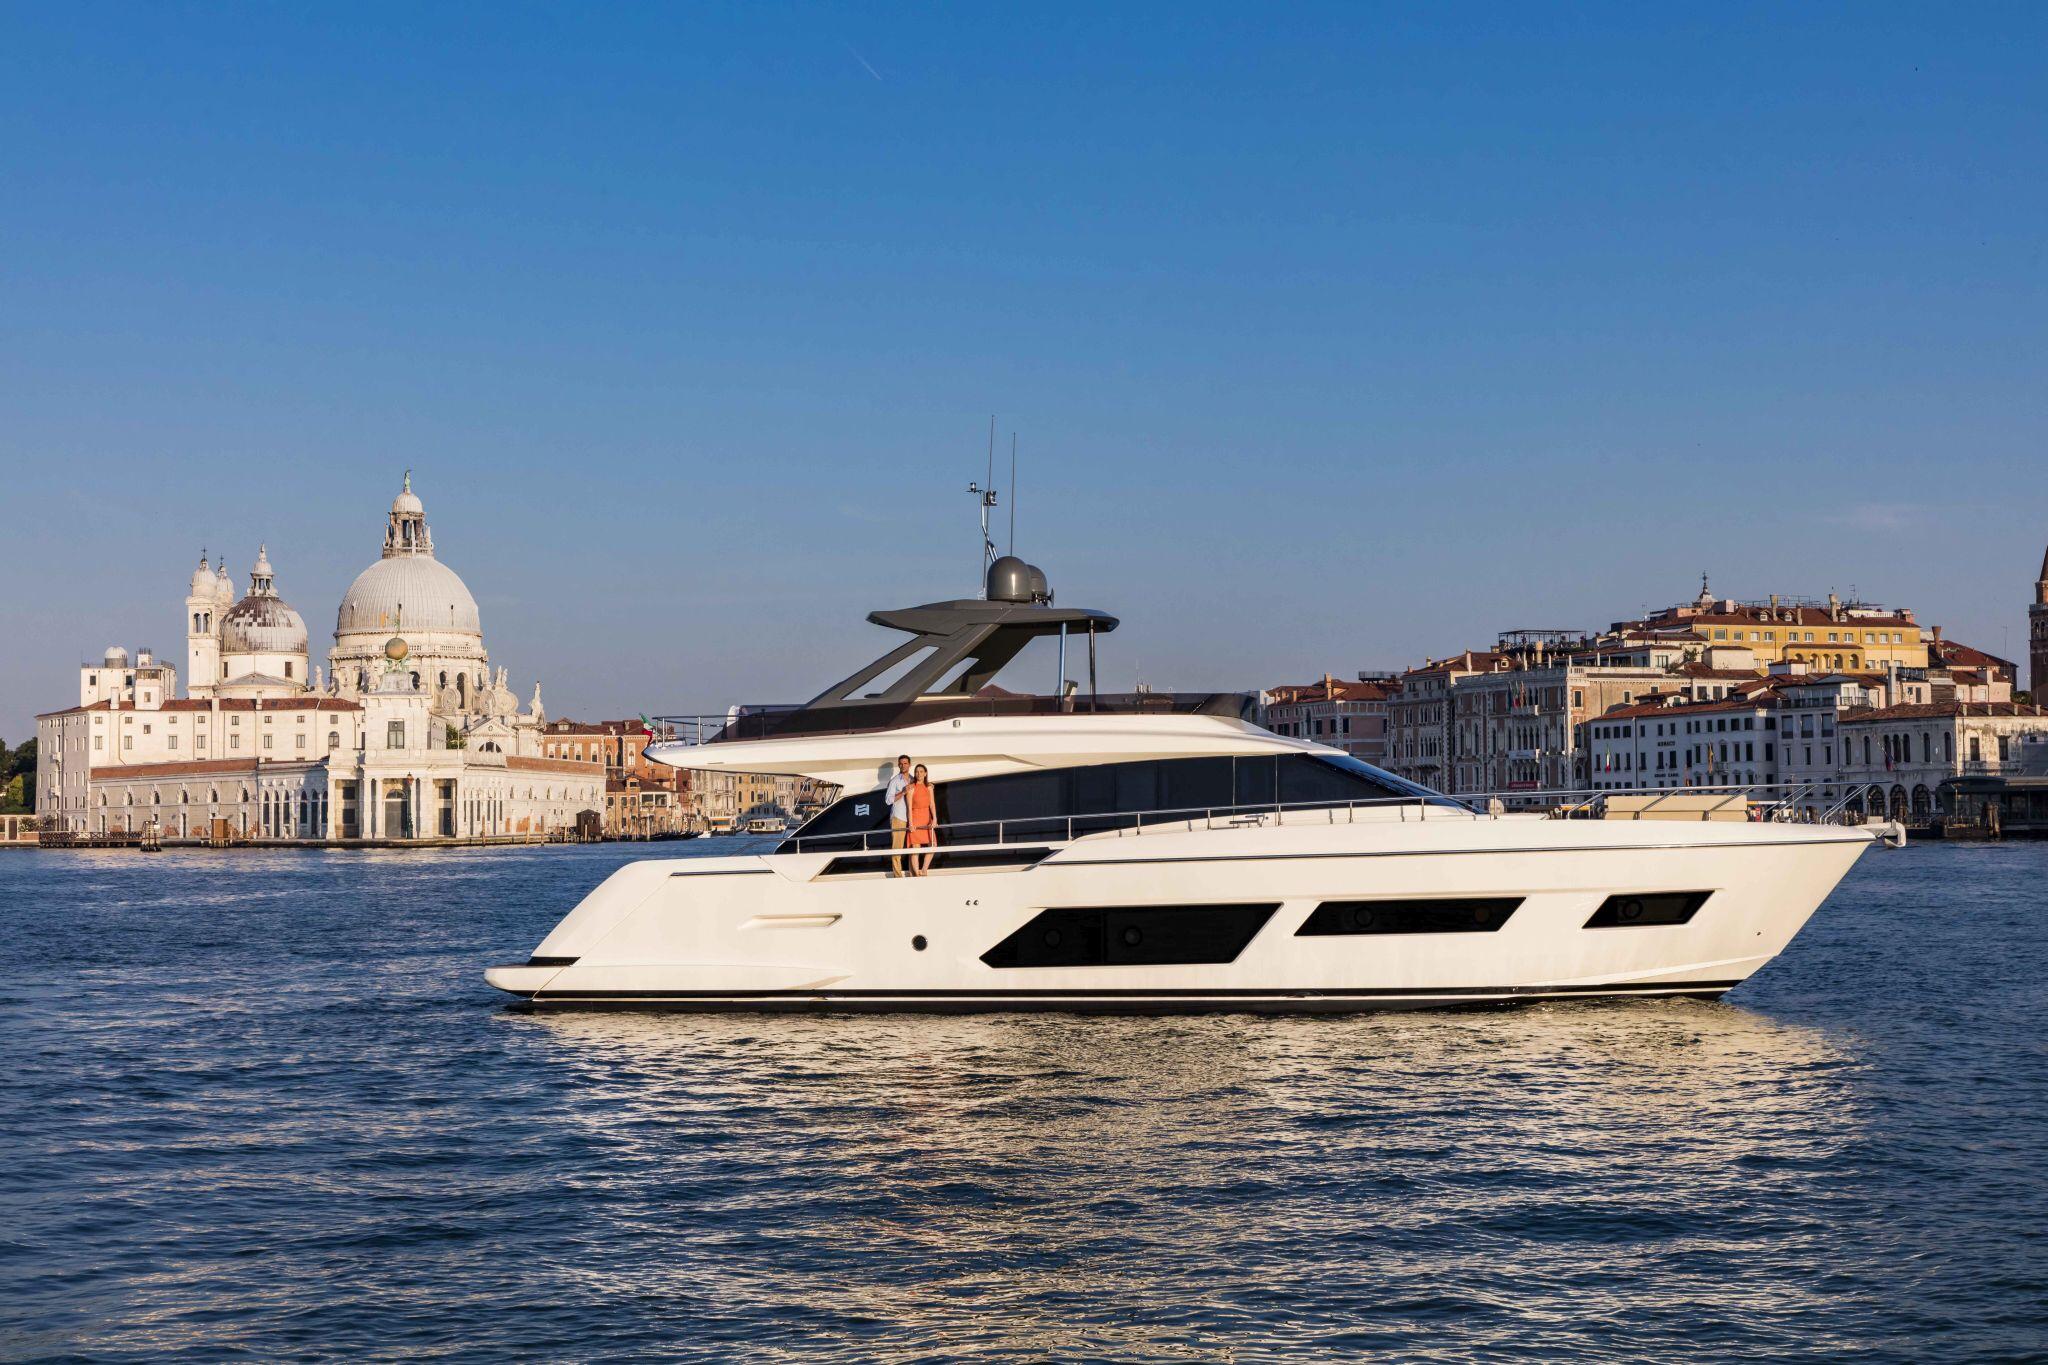 ferretti yachts 670 ferretti group JMA Yachting Port Fréjus Var vente location neuf occasion places de port